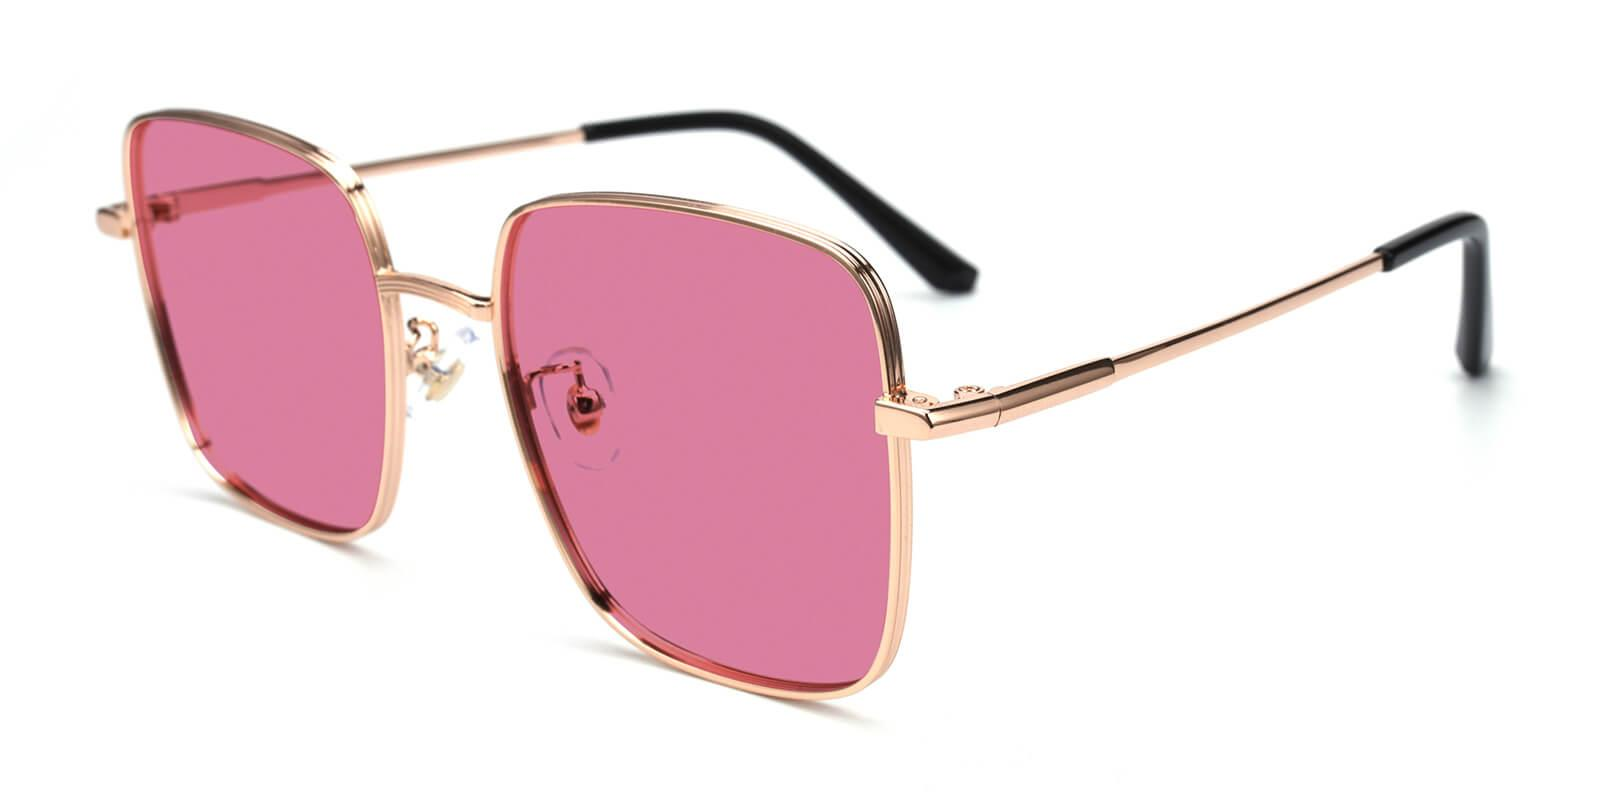 Noun-Gold-Square-Metal-Sunglasses-additional1